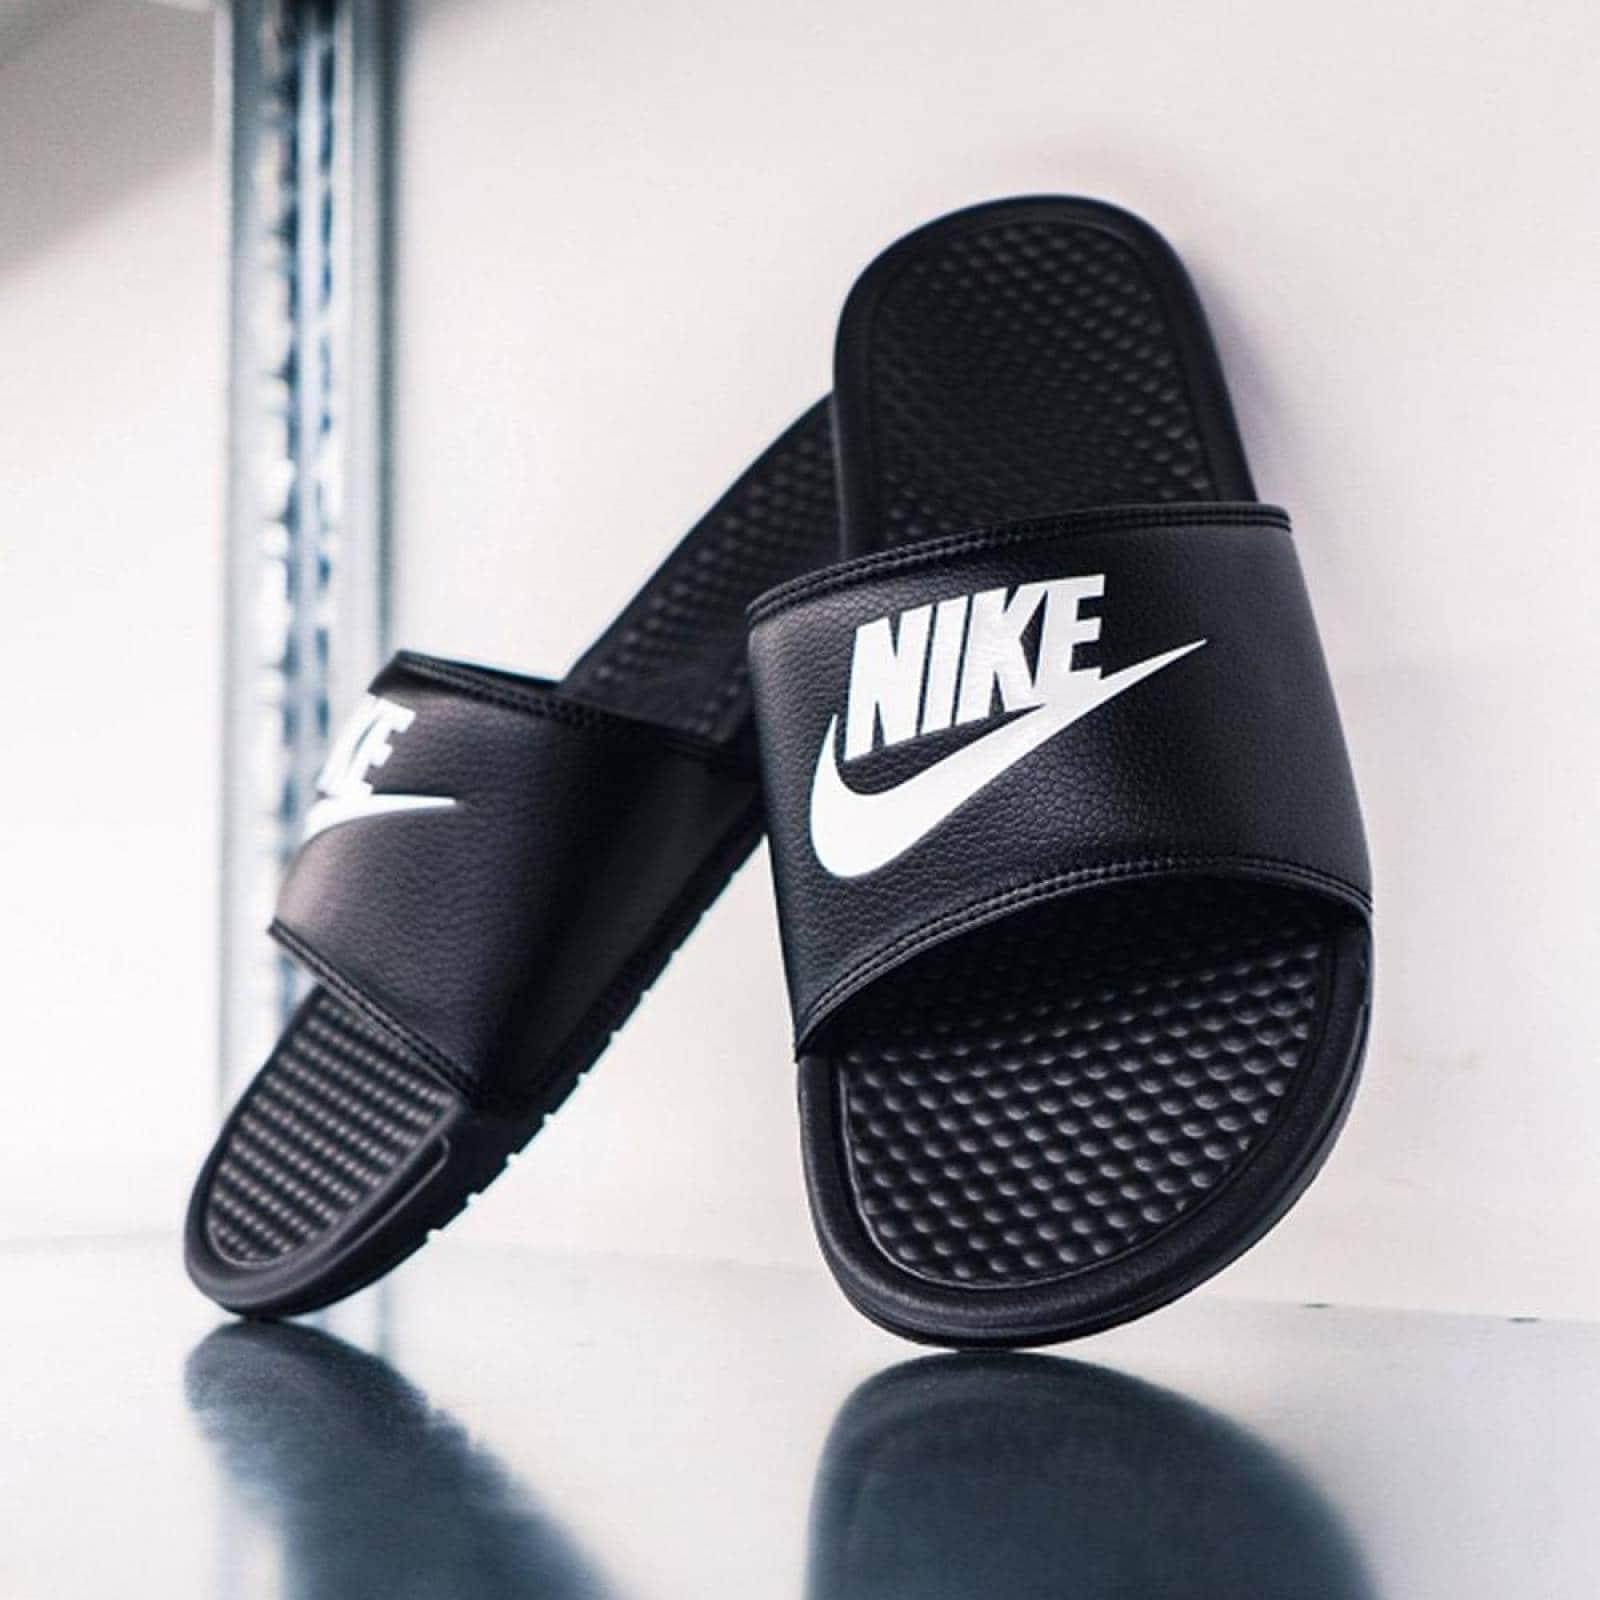 naranja estante Maestría  Sandalias Nike Benassi JDI - 343880090 - Negro - Hombre